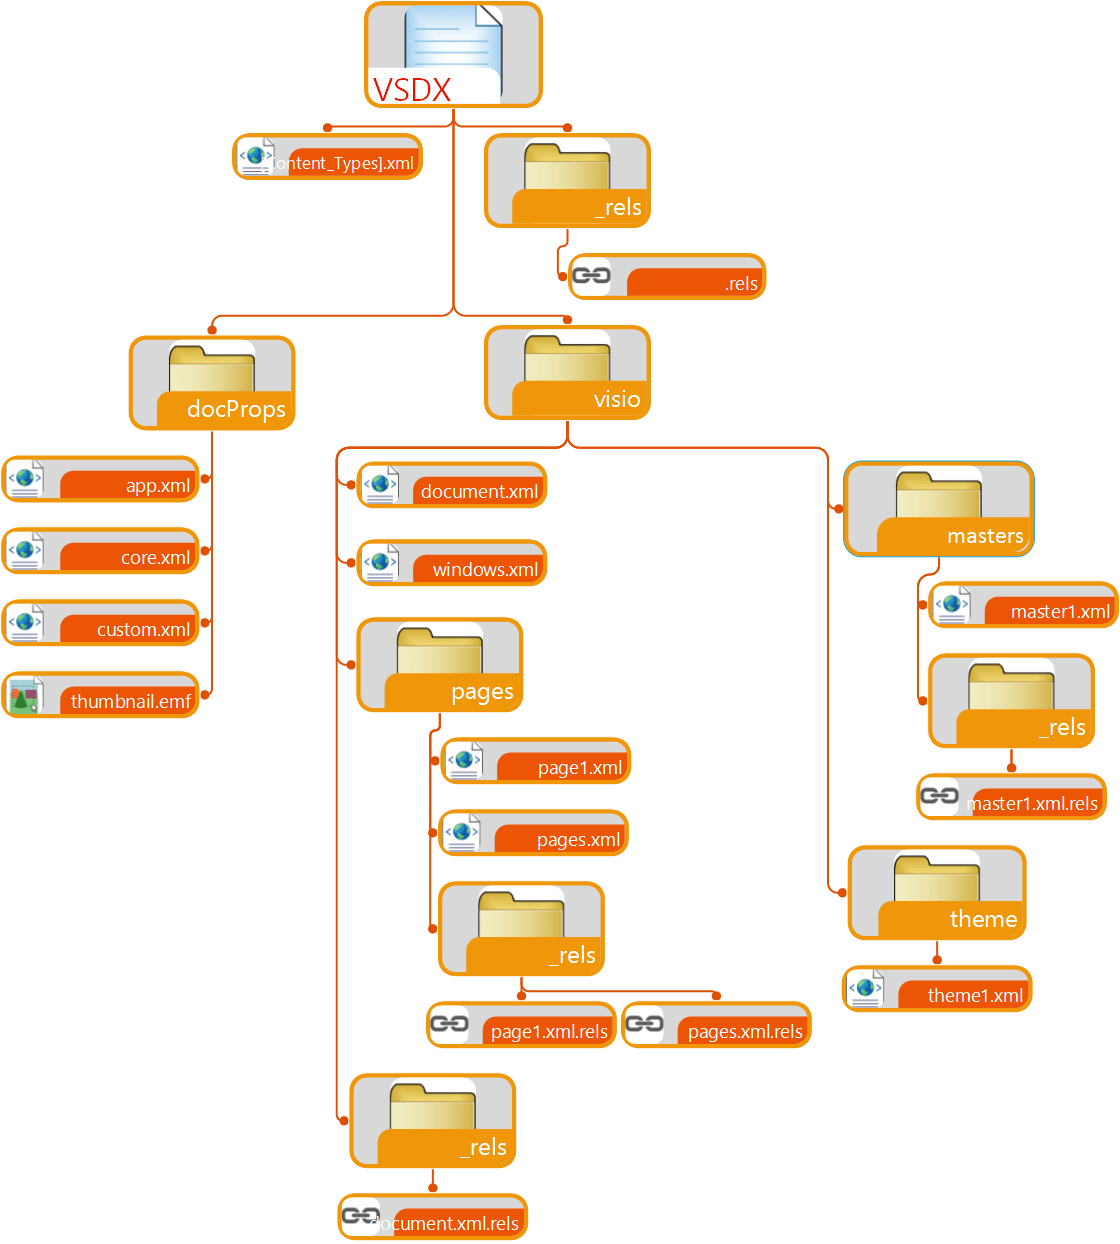 visio database model diagram template wiring tool vsdx the new file format microsoft 365 blog